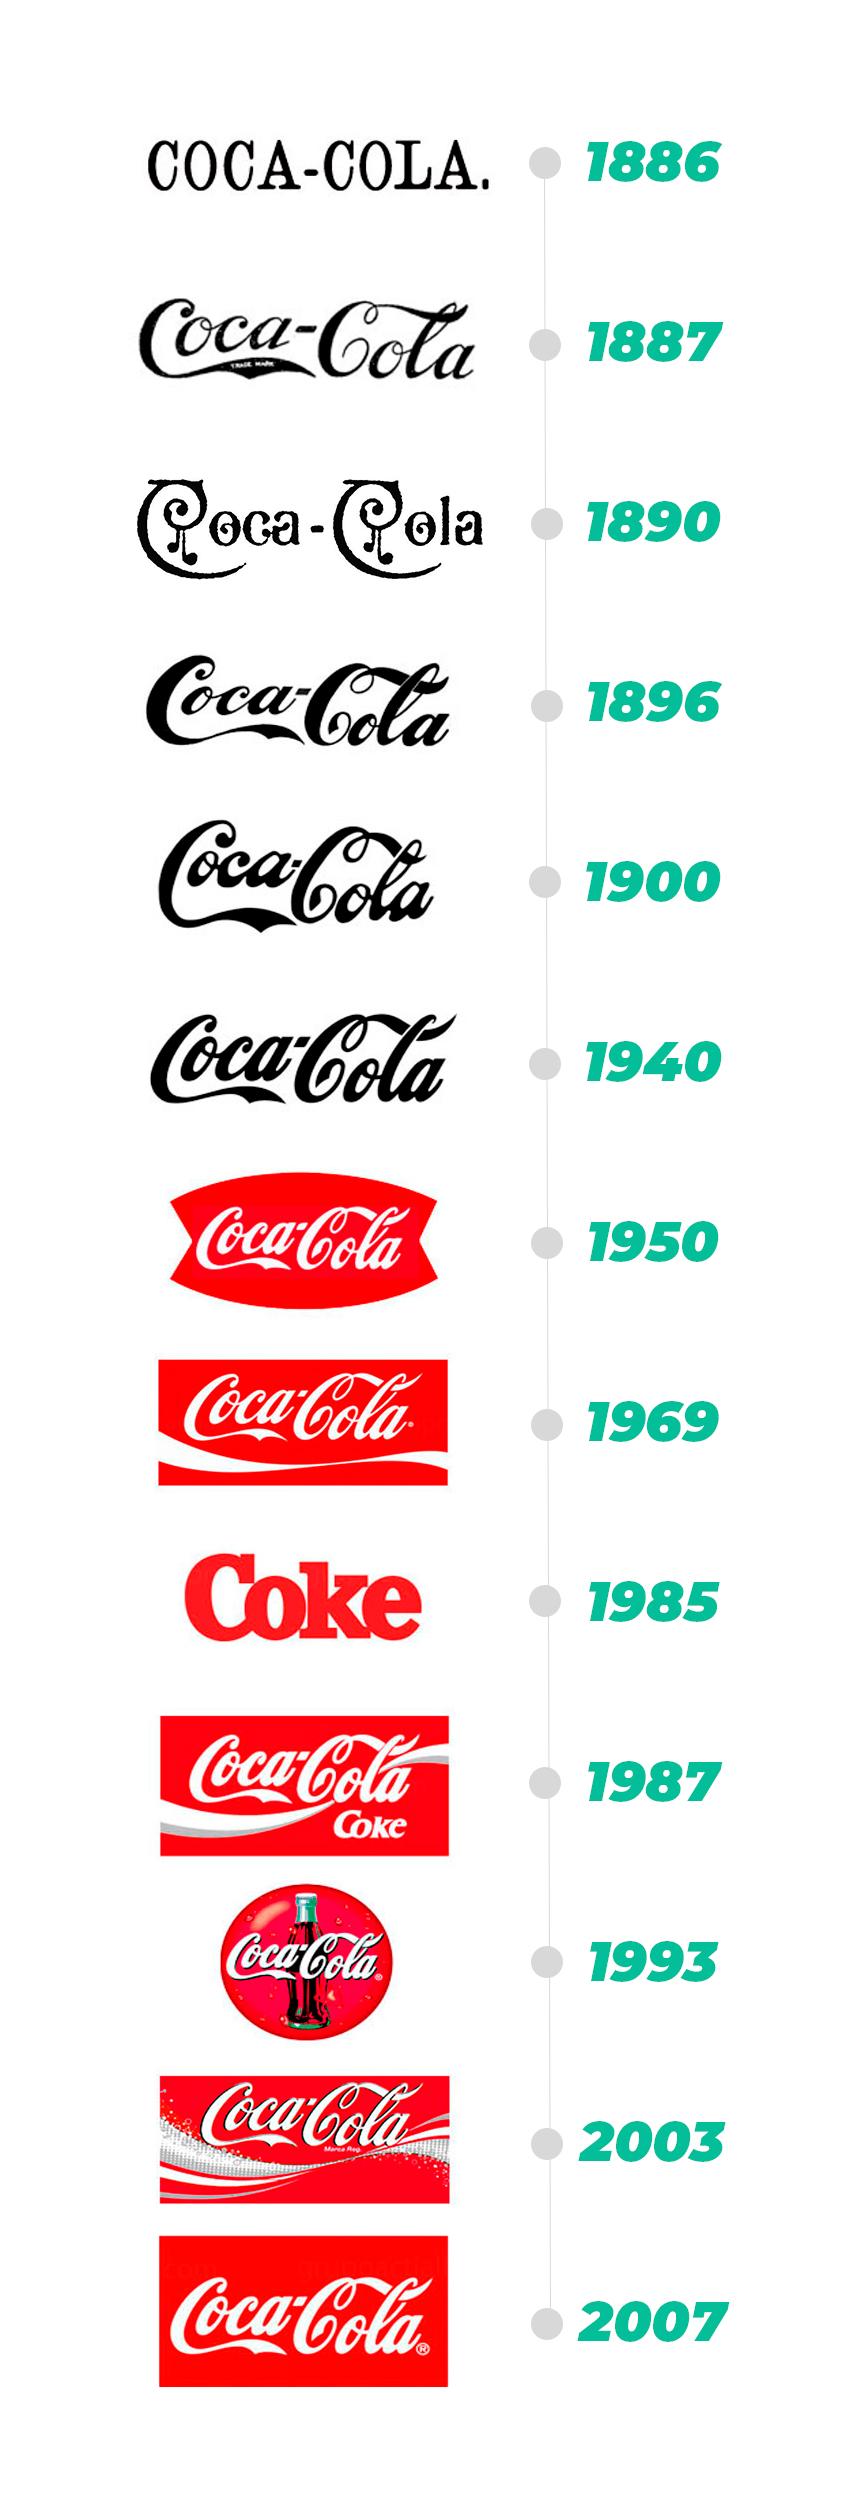 evolucion-logo-coca-cola-2